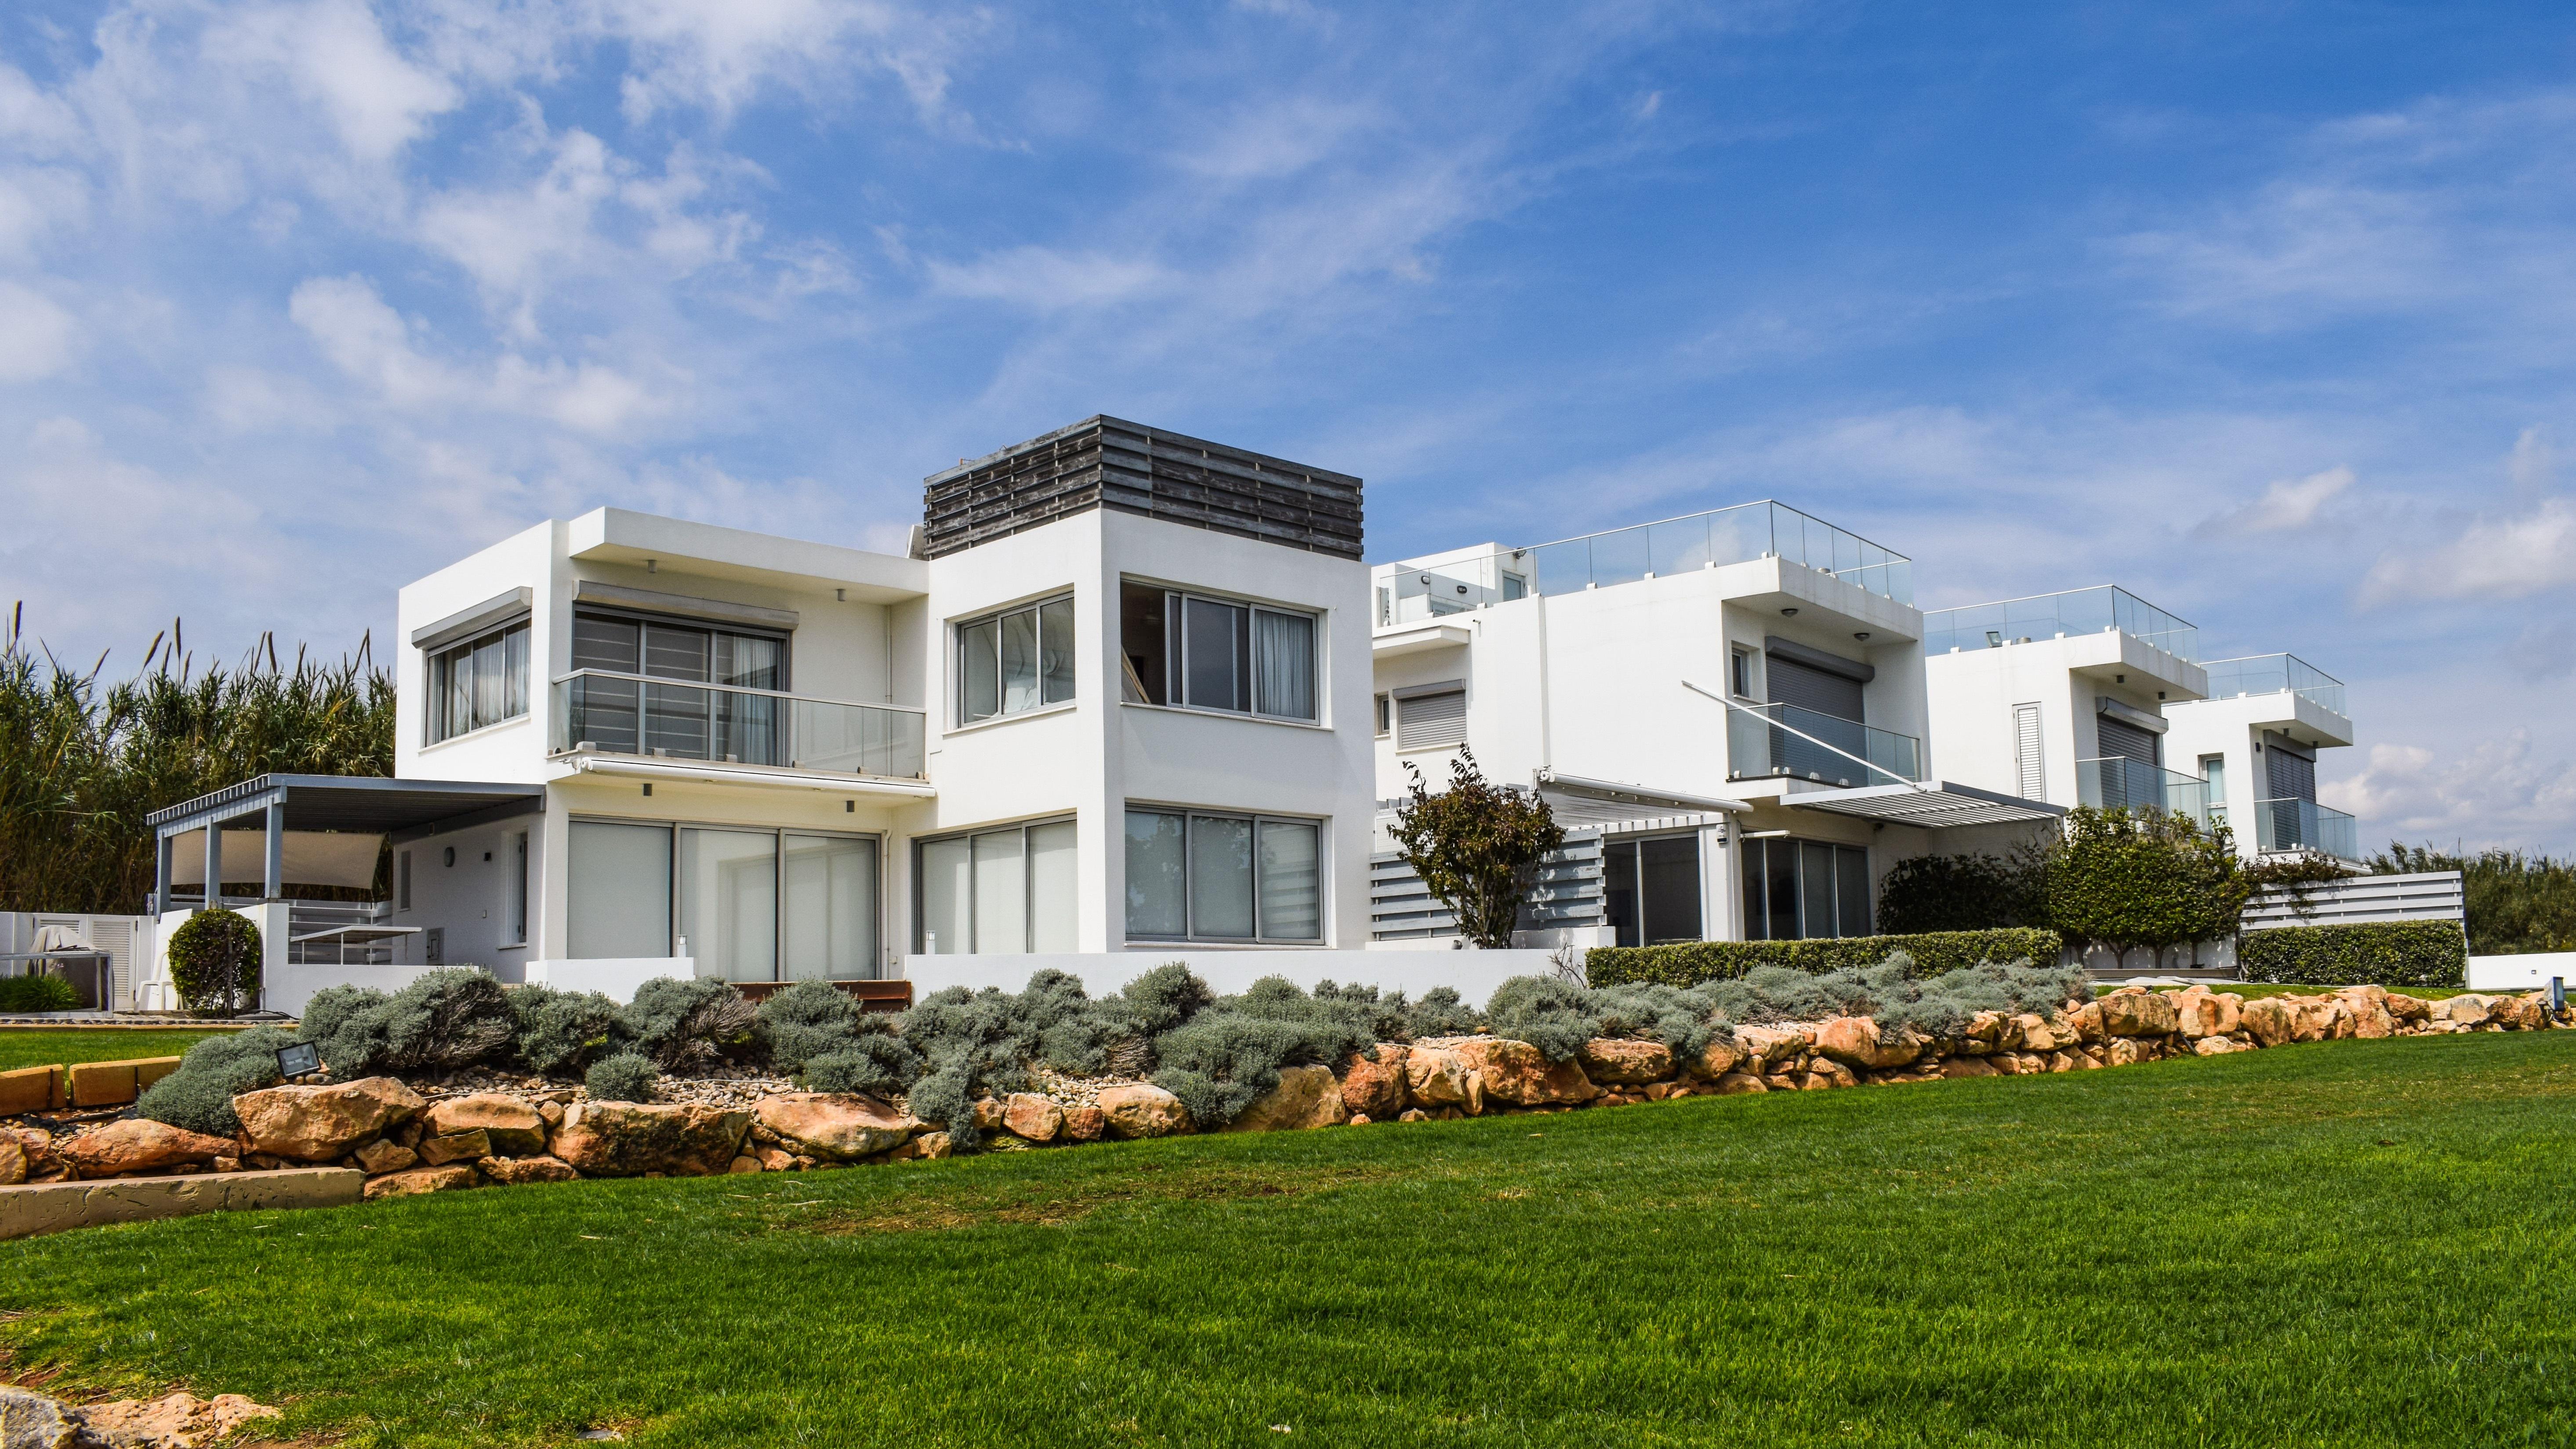 Residential Real Estate Development : Fotoğraf mimari çim villa konak ev bina kenar